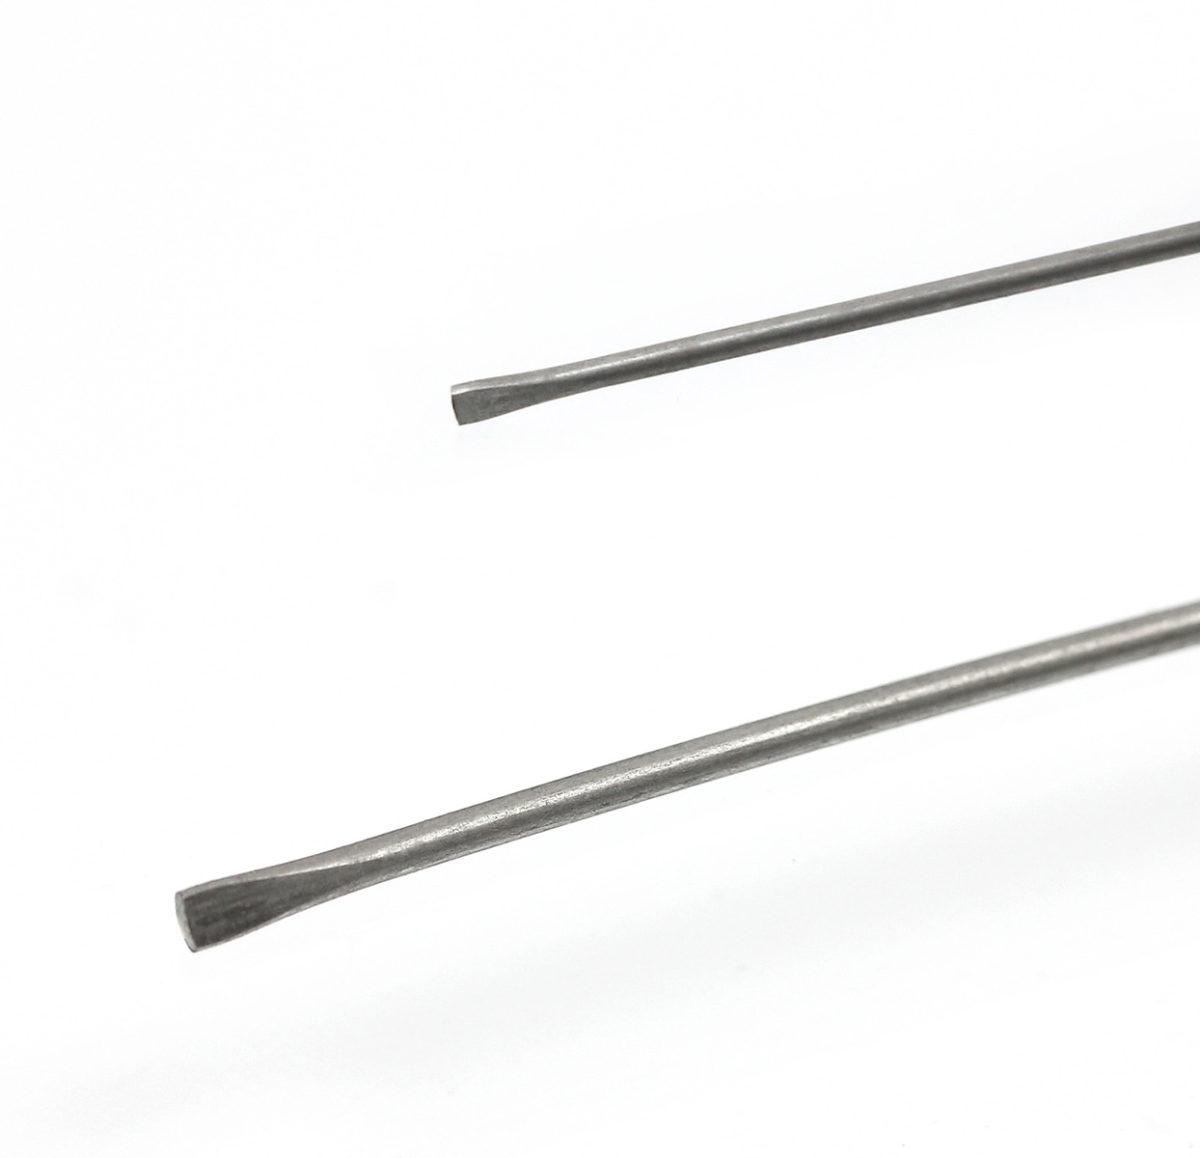 valentino ds round spring stainless steel 25 1